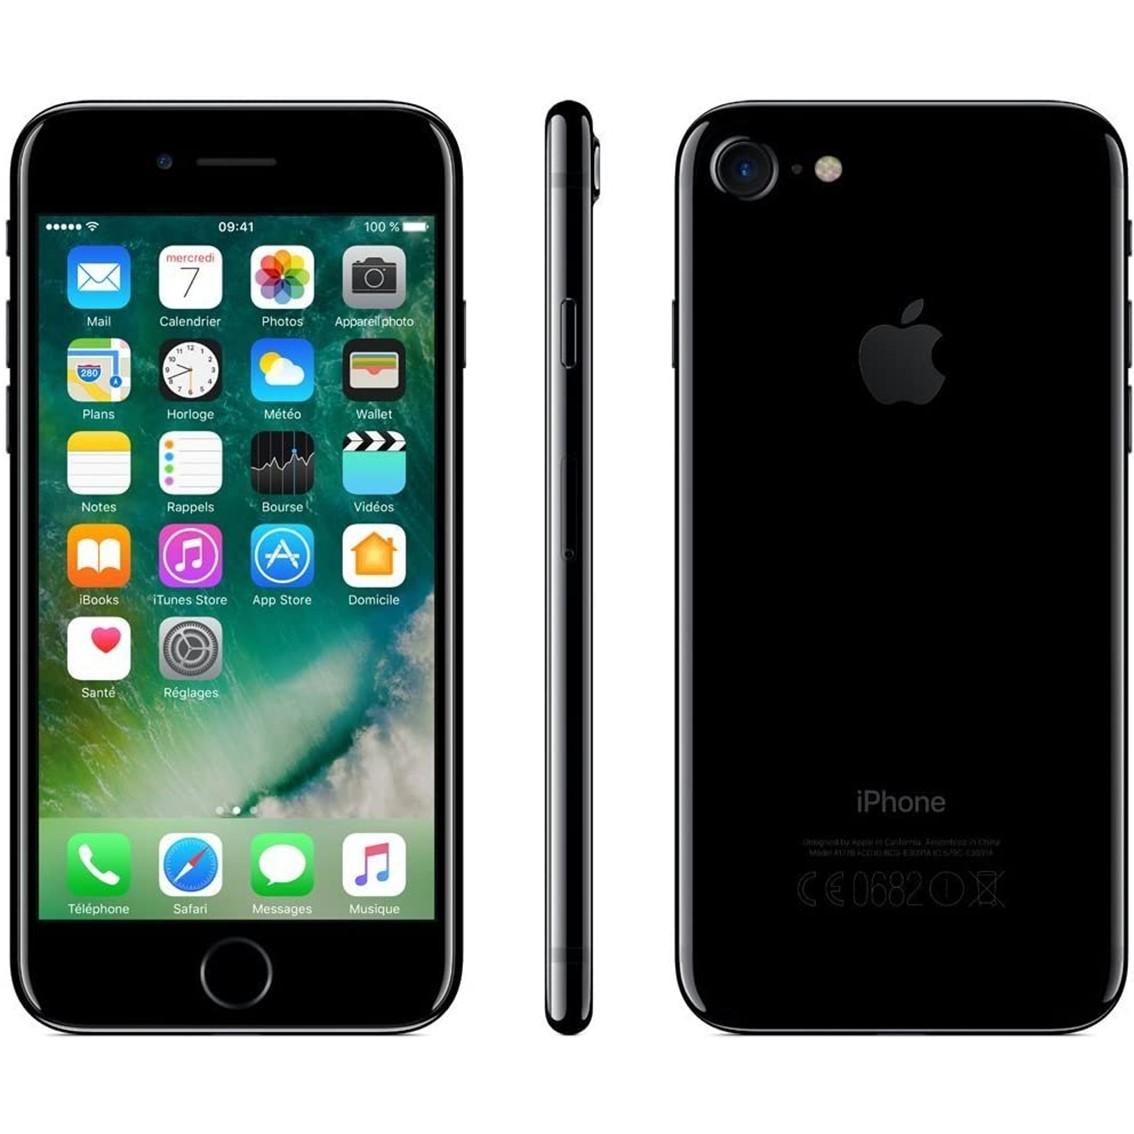 Telefono movil smartphone reware apple iphone 7 128gb jet black - 4.7pulgadas - reacondicionado - refurbish - grado a+